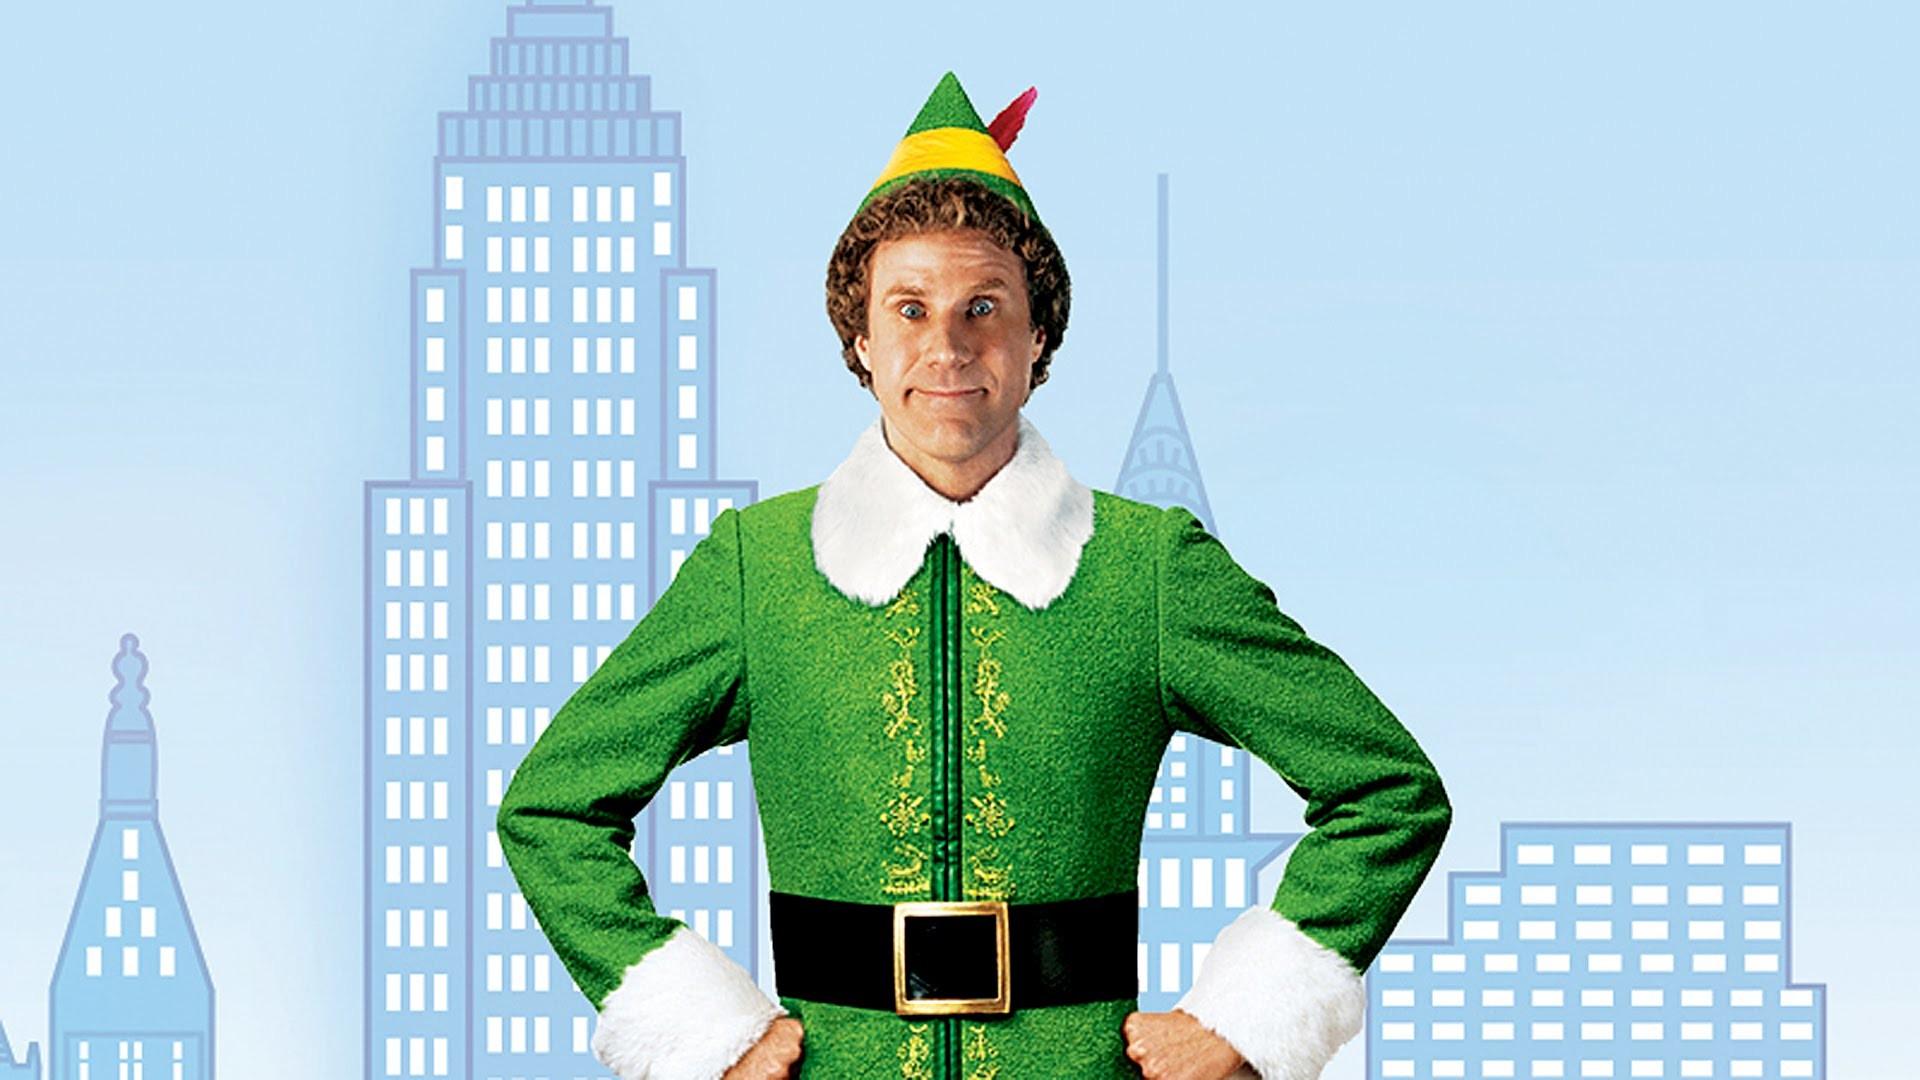 Elf Movie Wallpaper 56 Images